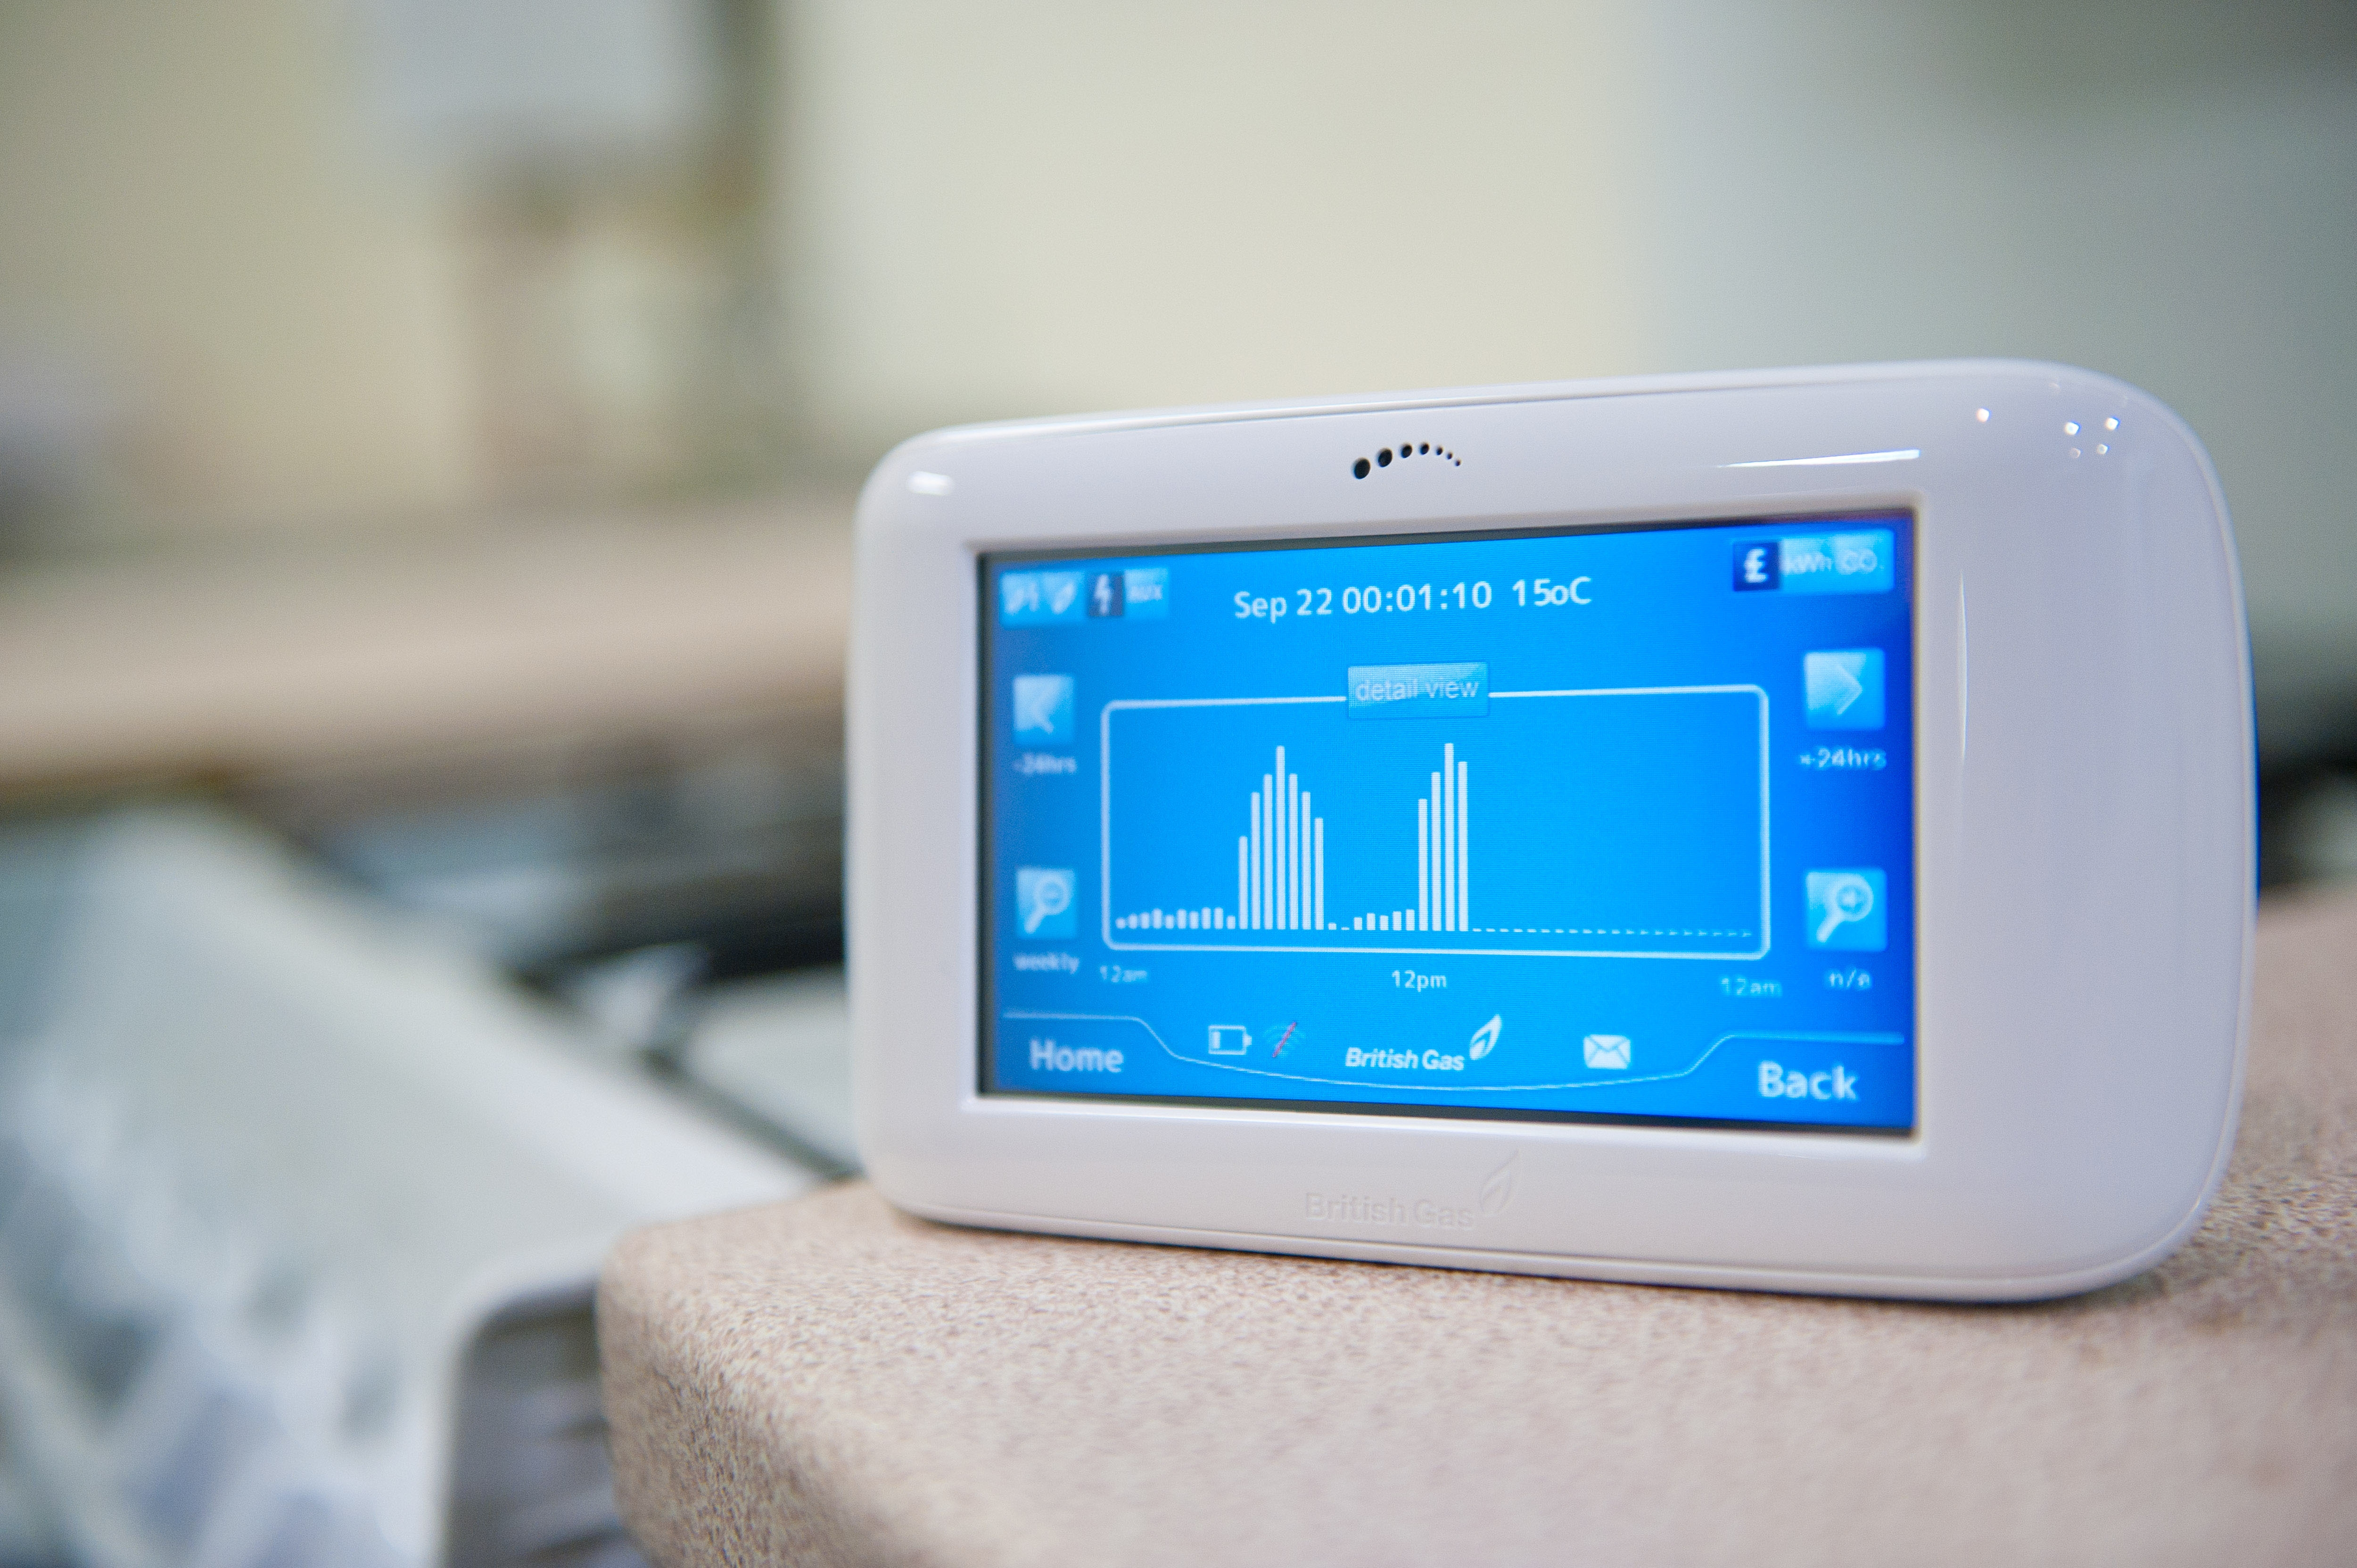 Digital Sentinel Smart Meters And Your Energy Bills